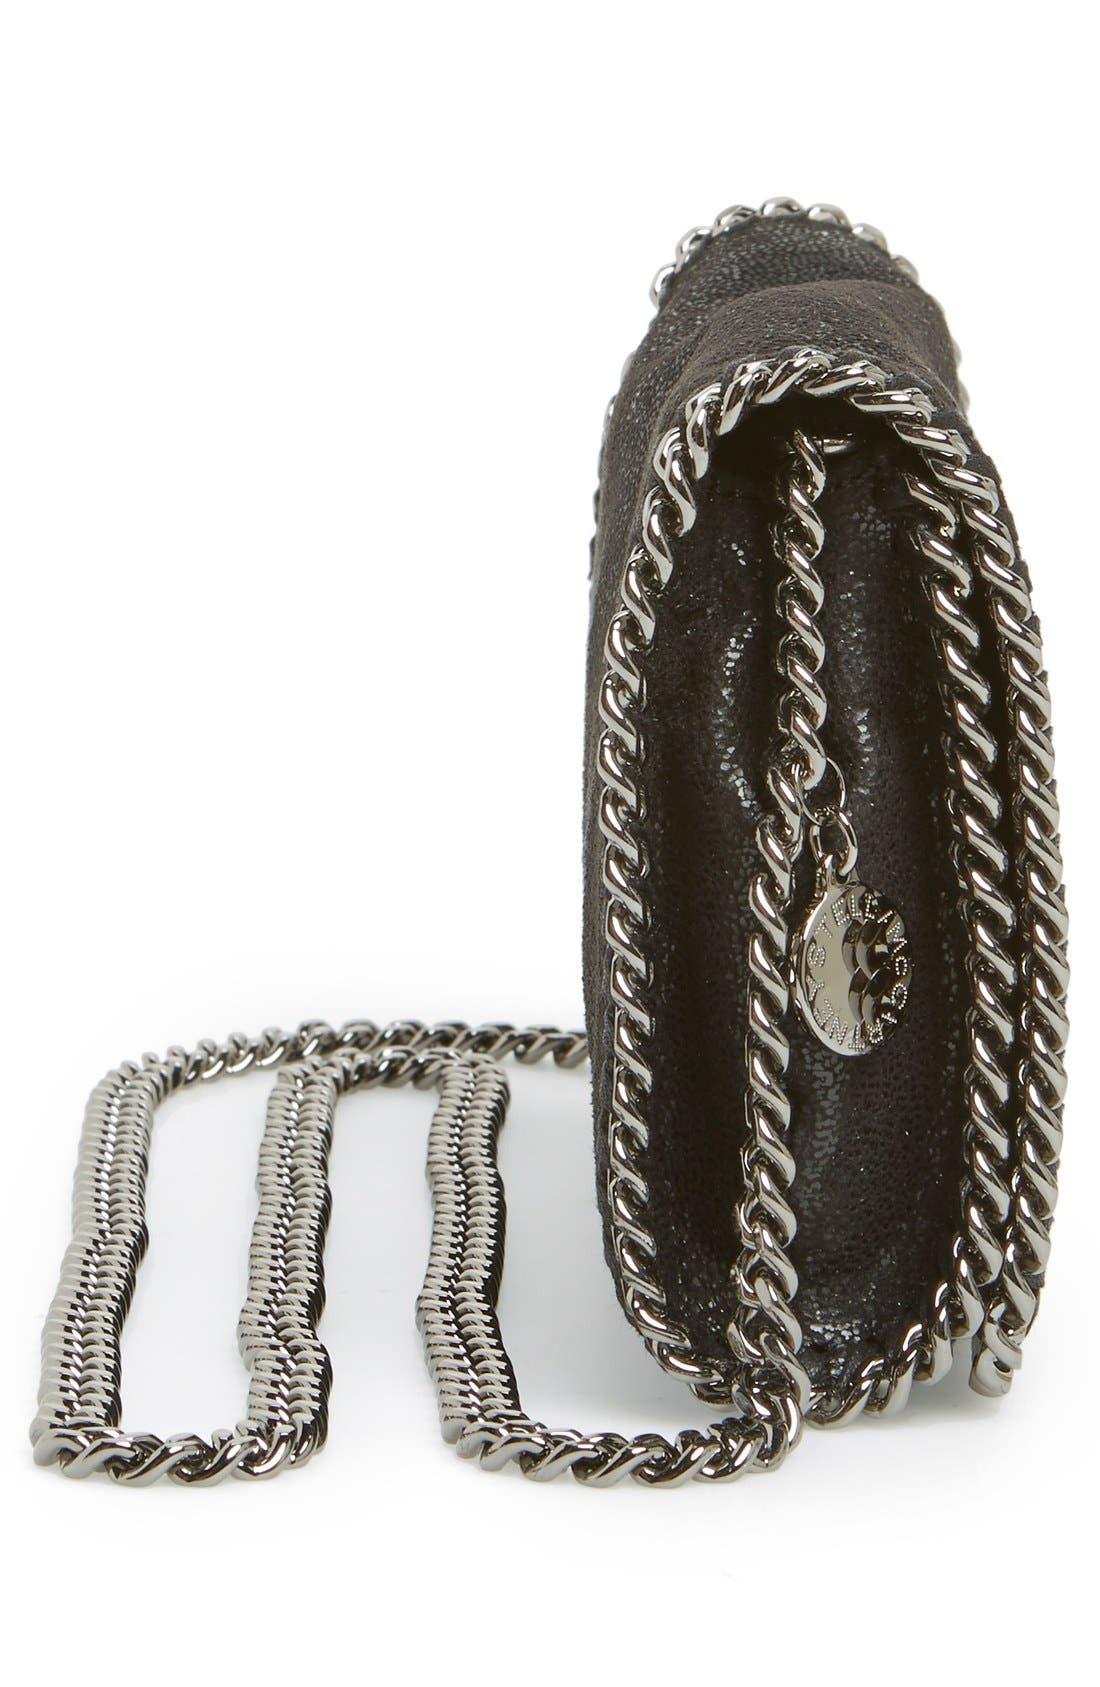 'Falabella - Shaggy Deer' Faux Leather Crossbody Bag,                             Alternate thumbnail 10, color,                             BLACK SLVR HRDWR